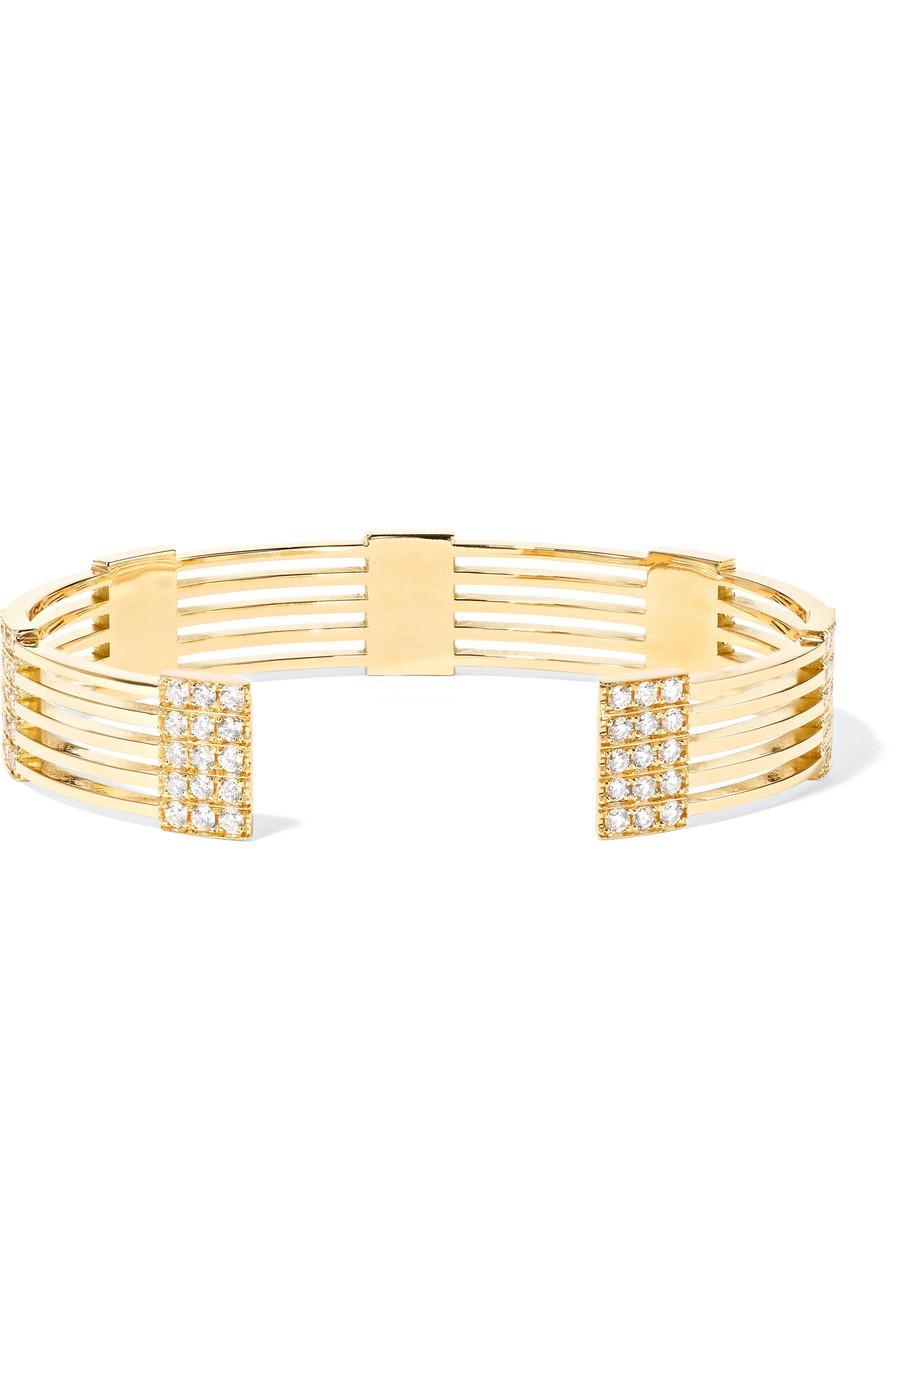 Melissa Kaye Izzy 18-karat Gold Diamond Cuff 9N04b1